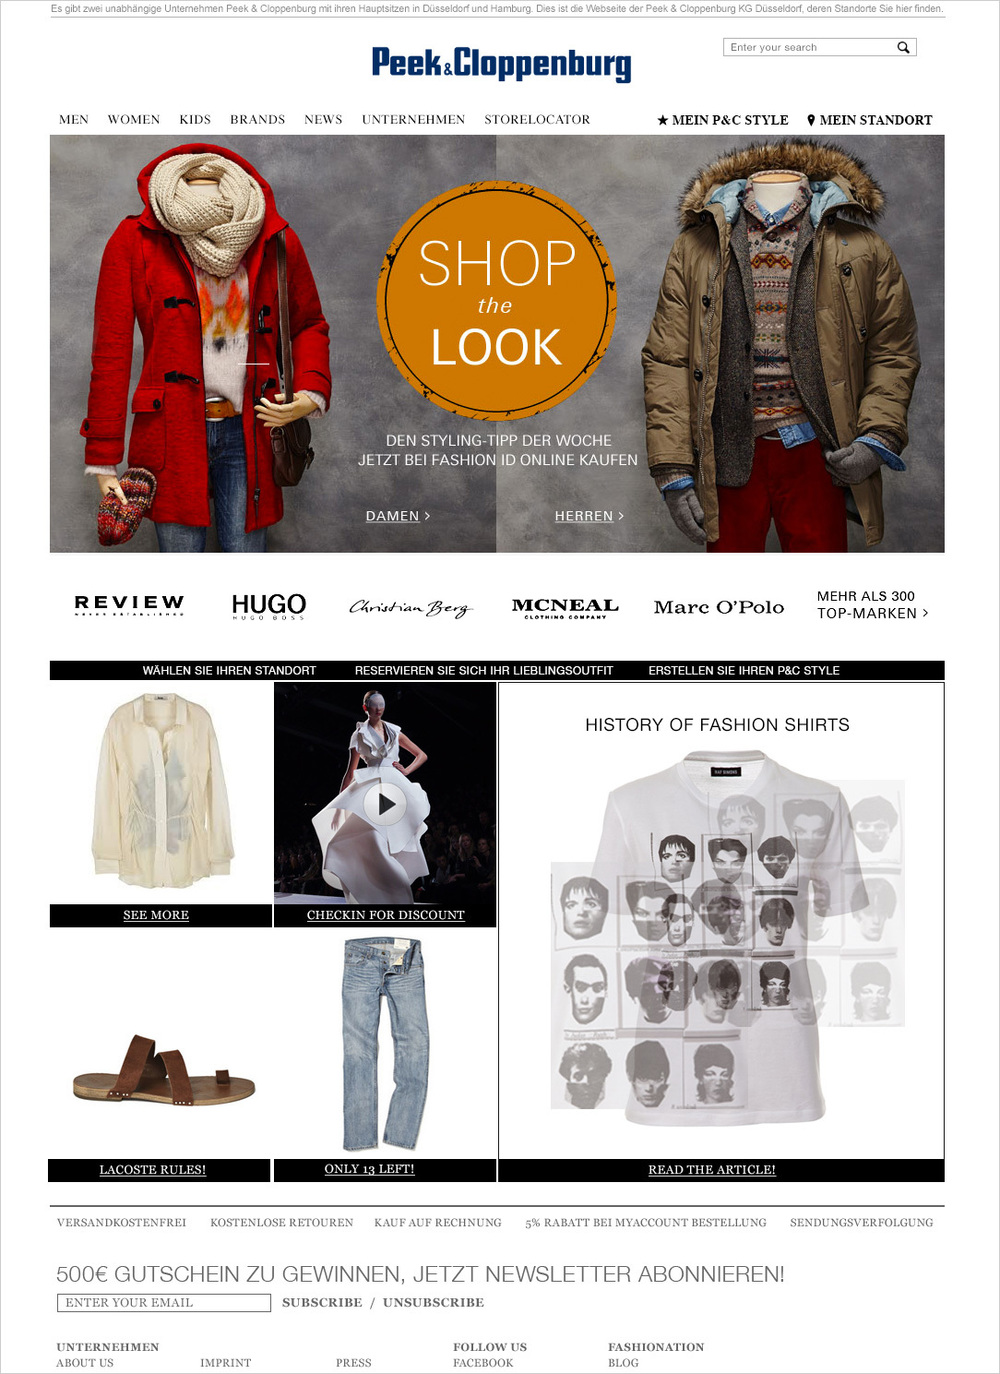 WERBEWELT-Peek-Cloppenburg-eCommerce-Online-Store-1.jpg